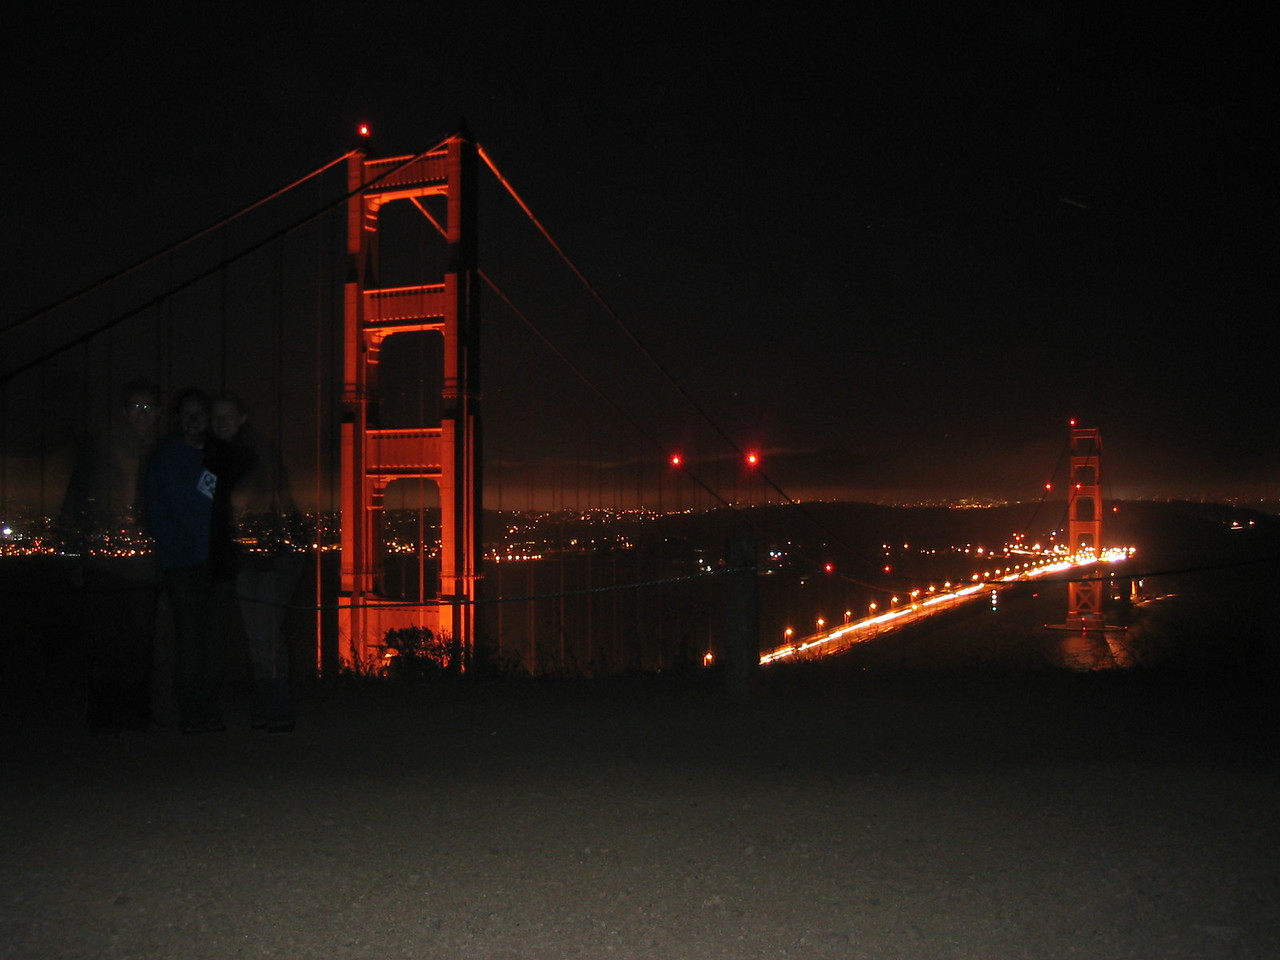 2004 07 12 Monday - Melody sees dead people @ Golden Gate Bridge  1